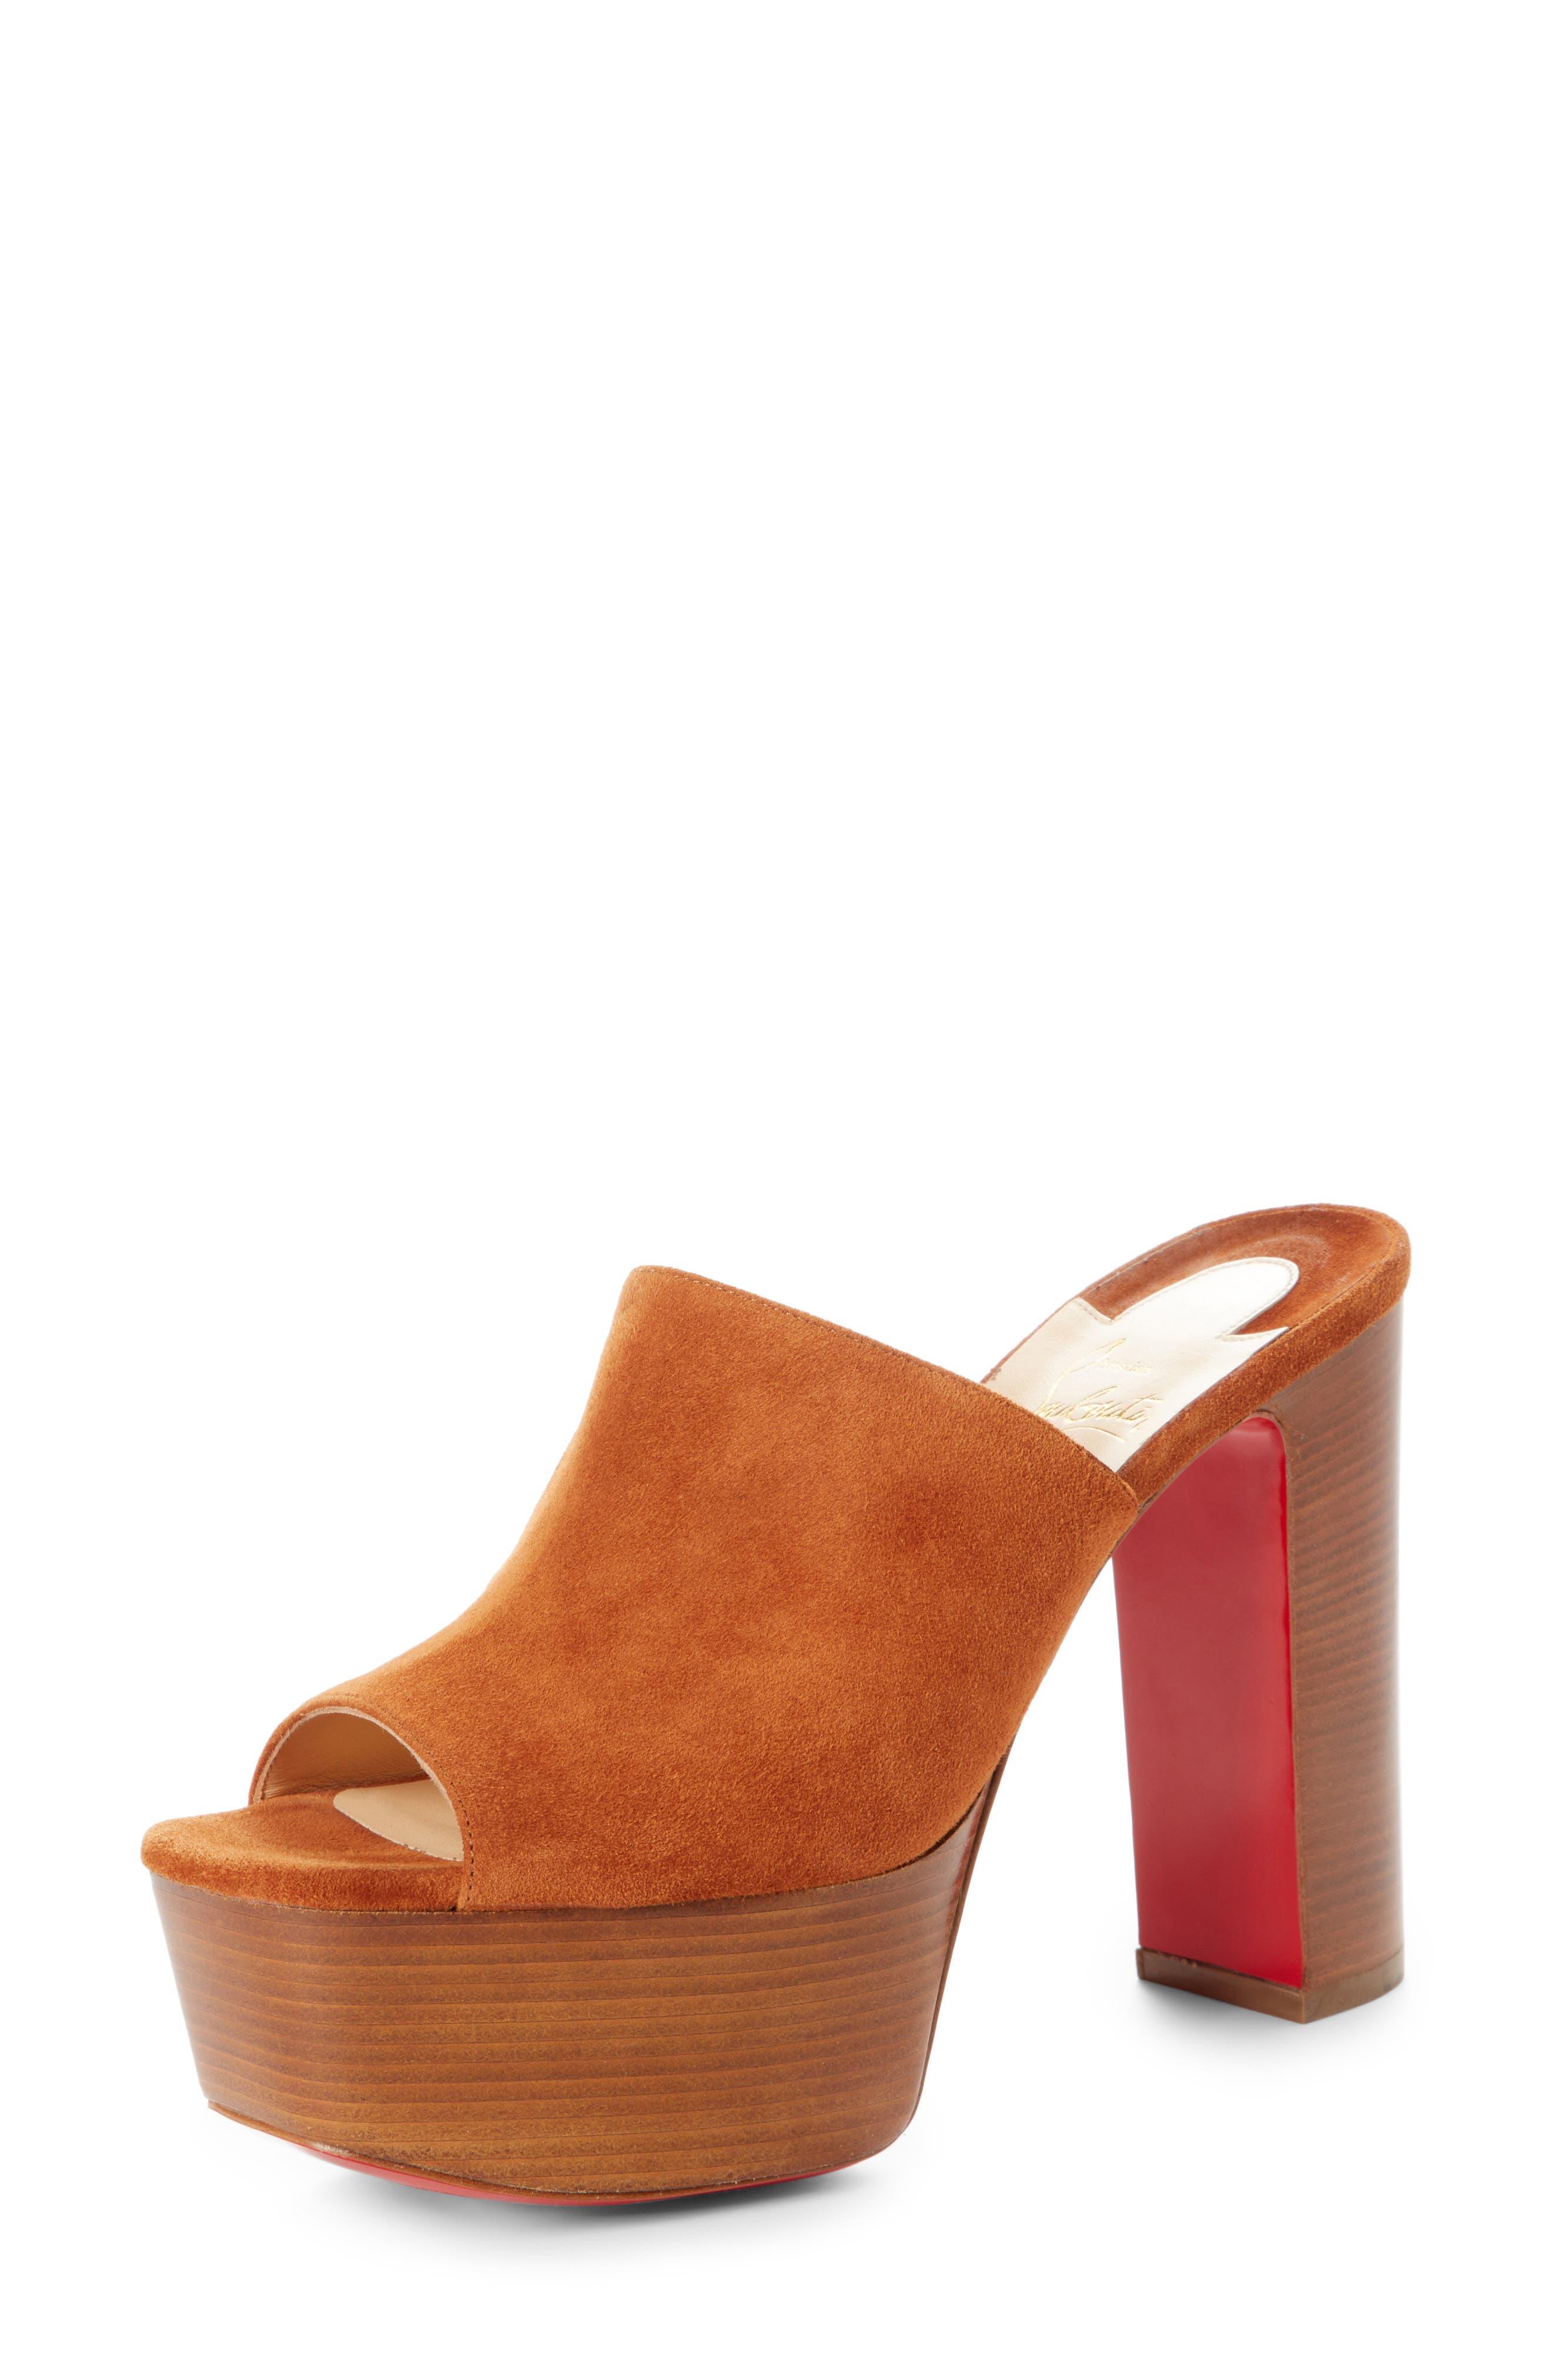 Christian Louboutin Suede Platform Mule Sandal (Women)